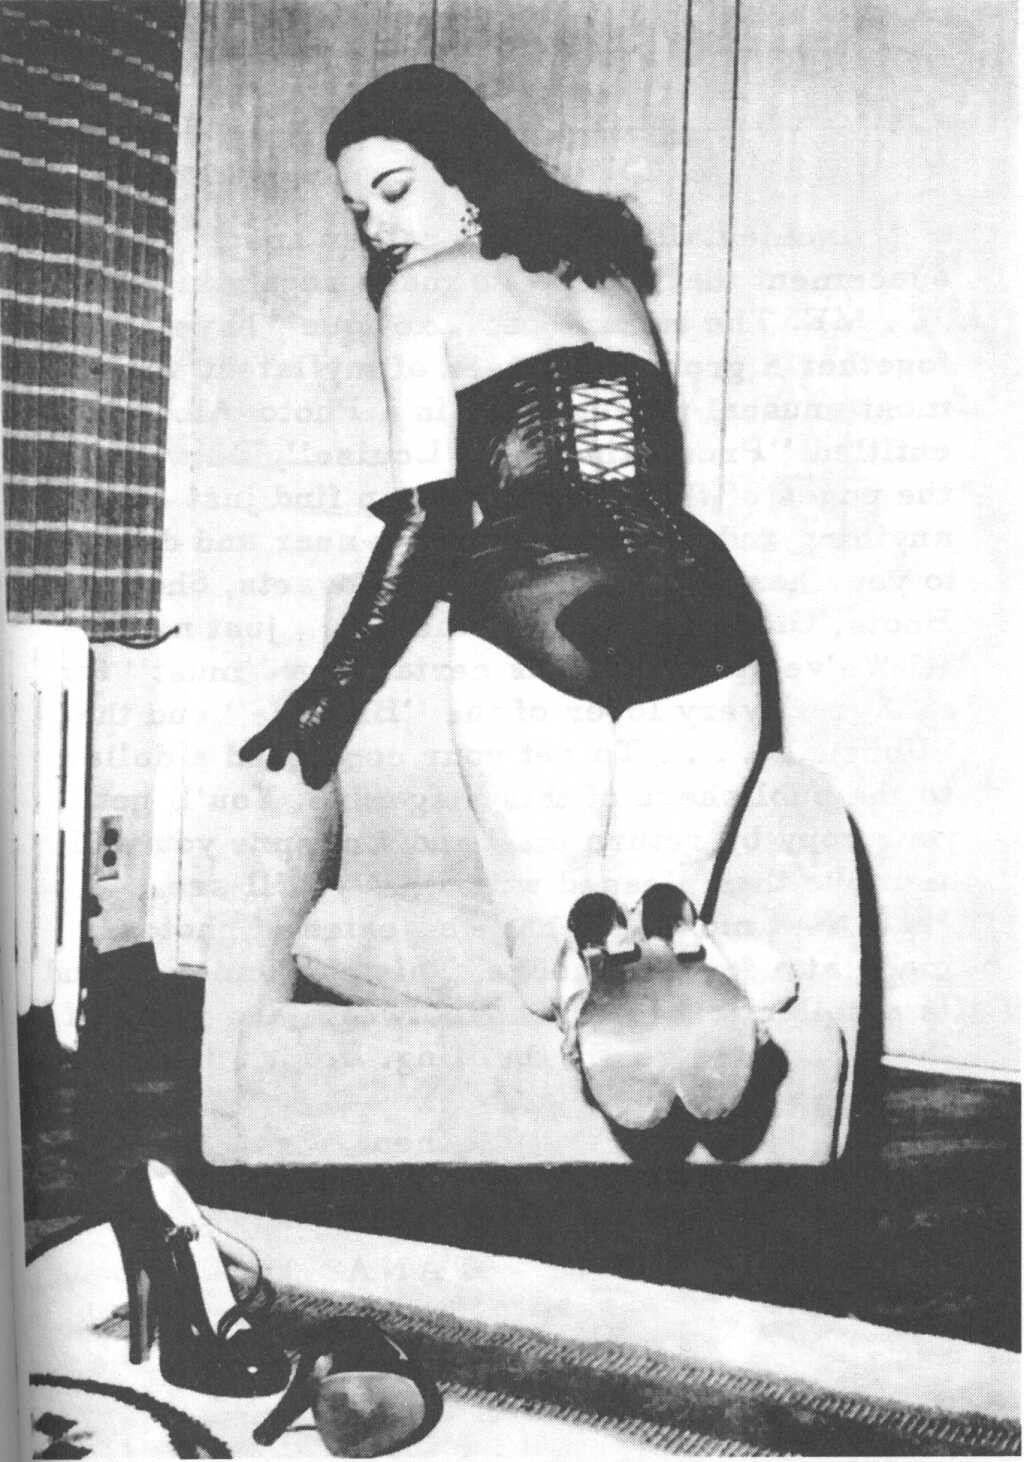 Helen Baxendale (born 1970),Diana Barrymore Sex video Brunella Bovo,Suzanne Maddock